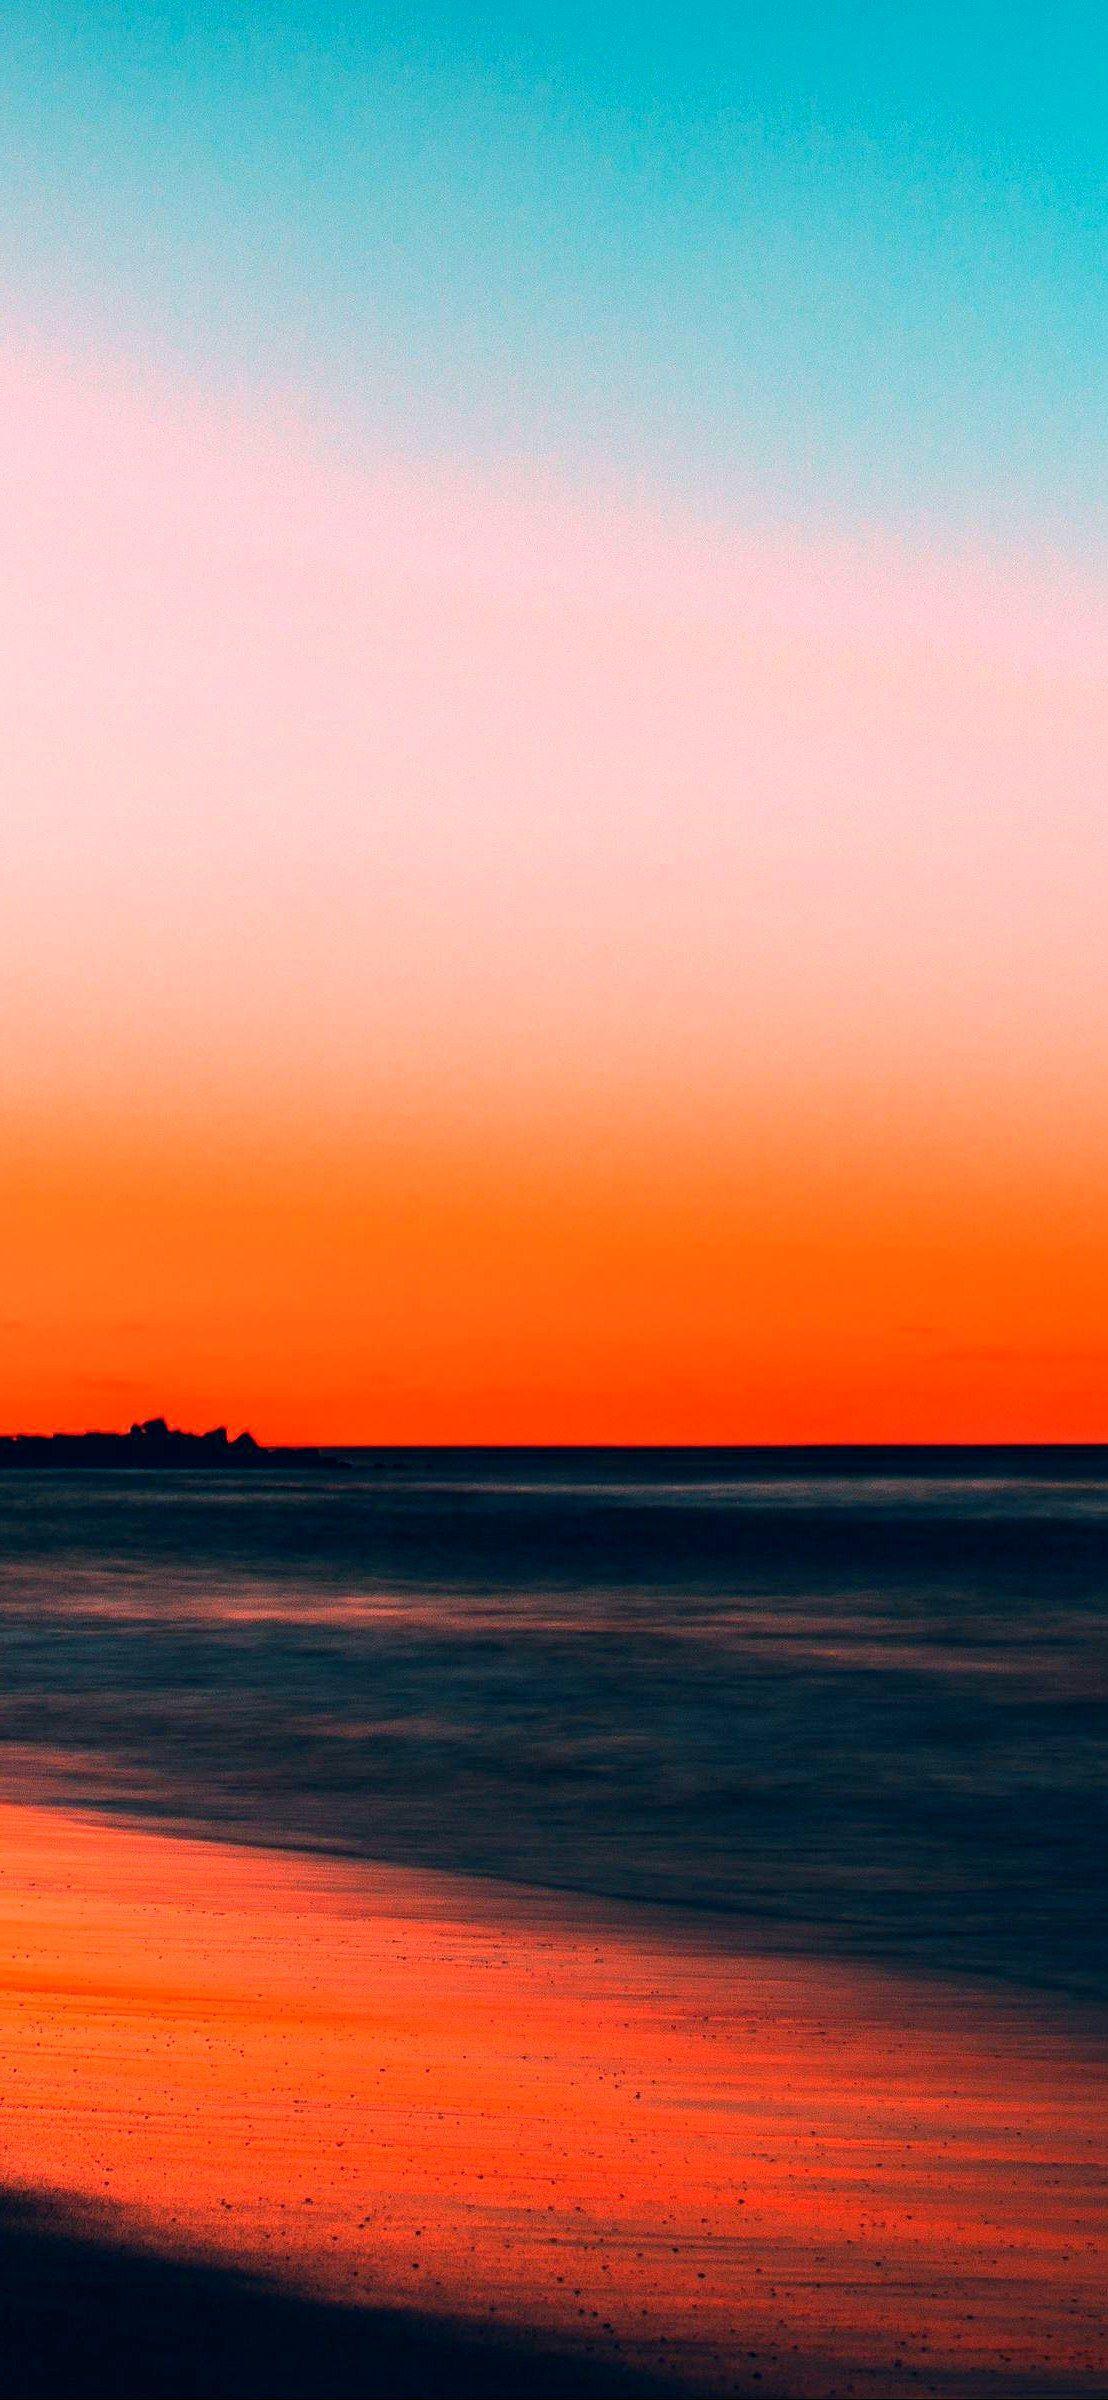 Iphone X Wallpaper Sea Sunset Horizon Hd Best Home Design Ideas Sunset Sky Sunset Wallpaper Forest Wallpaper Iphone